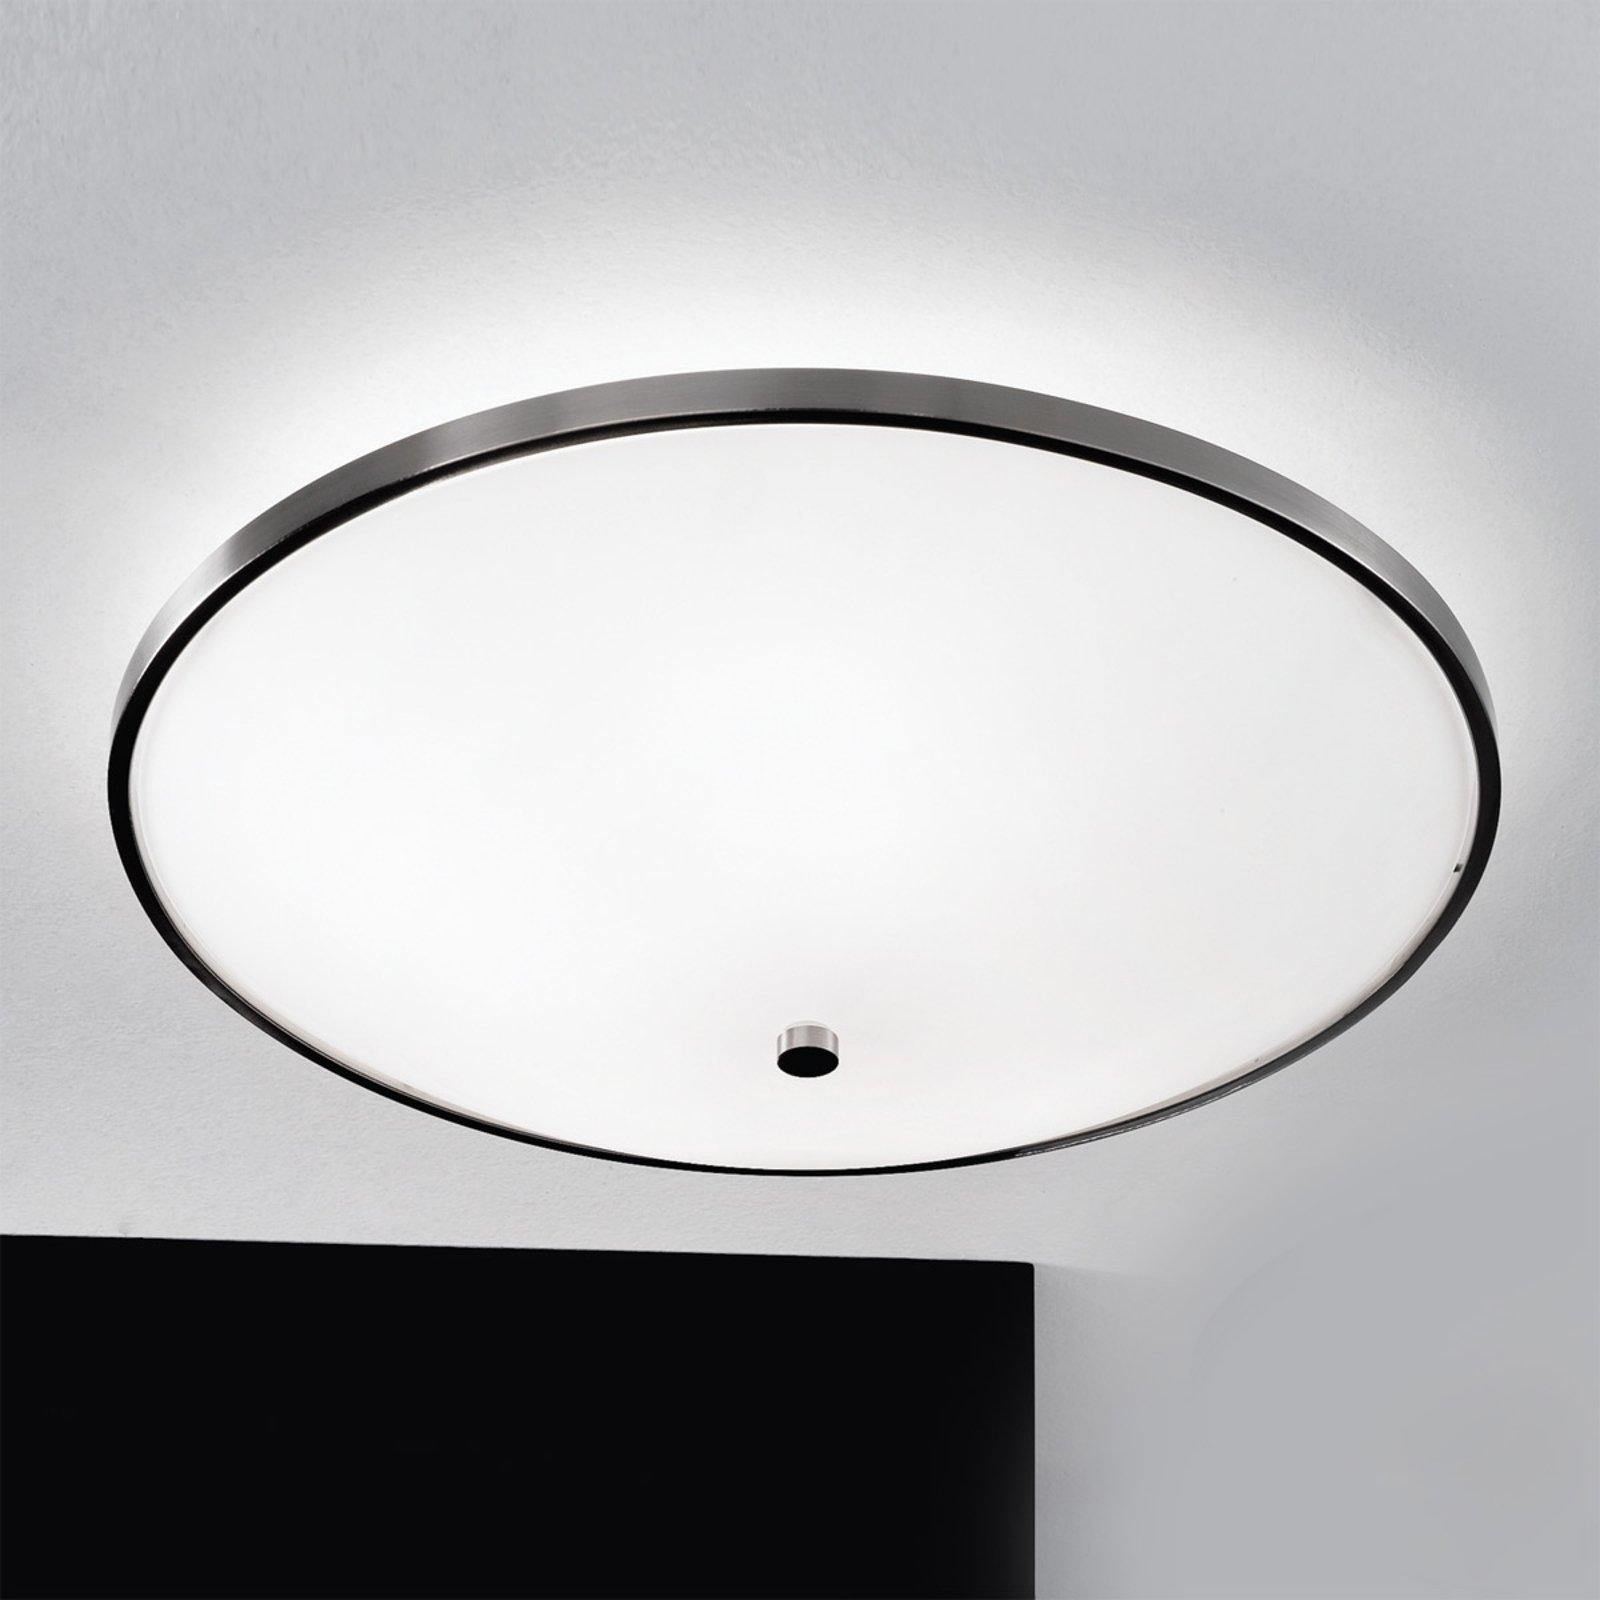 Fleksibel Samira taklampe 56,5 cm